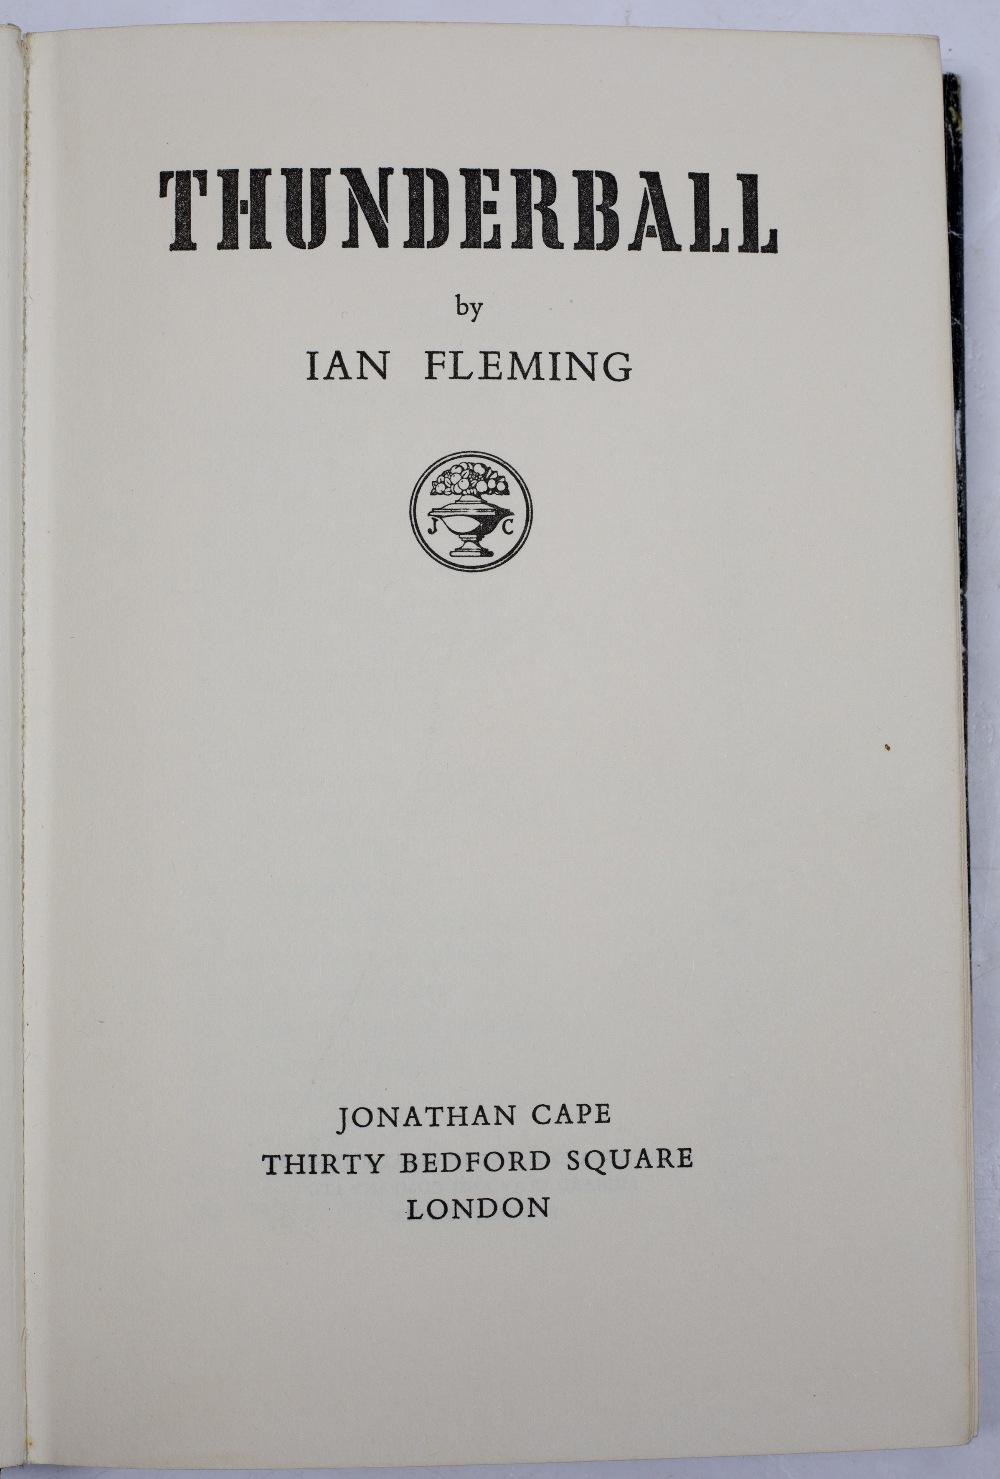 FLEMING, Ian, Thunderball. 1st Edition. London, Jonathan Cape, 1961. Original brown skeletal hand - Image 2 of 3